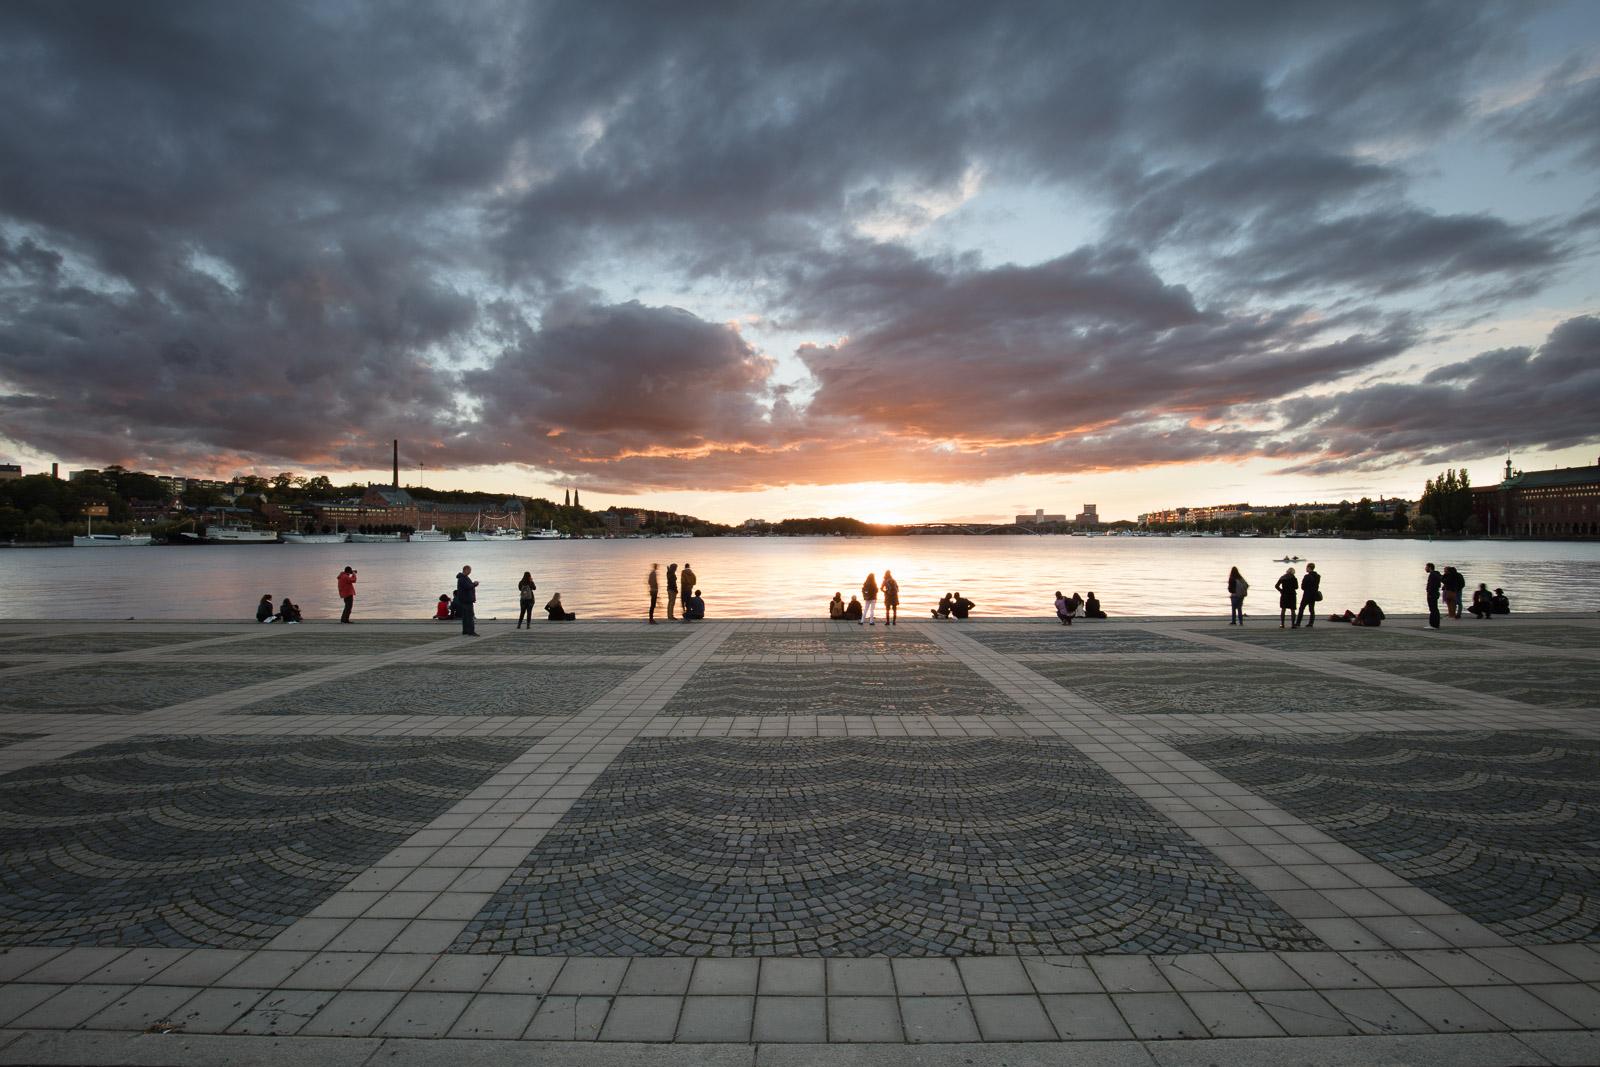 161002-stockholm-396-Edit.jpg